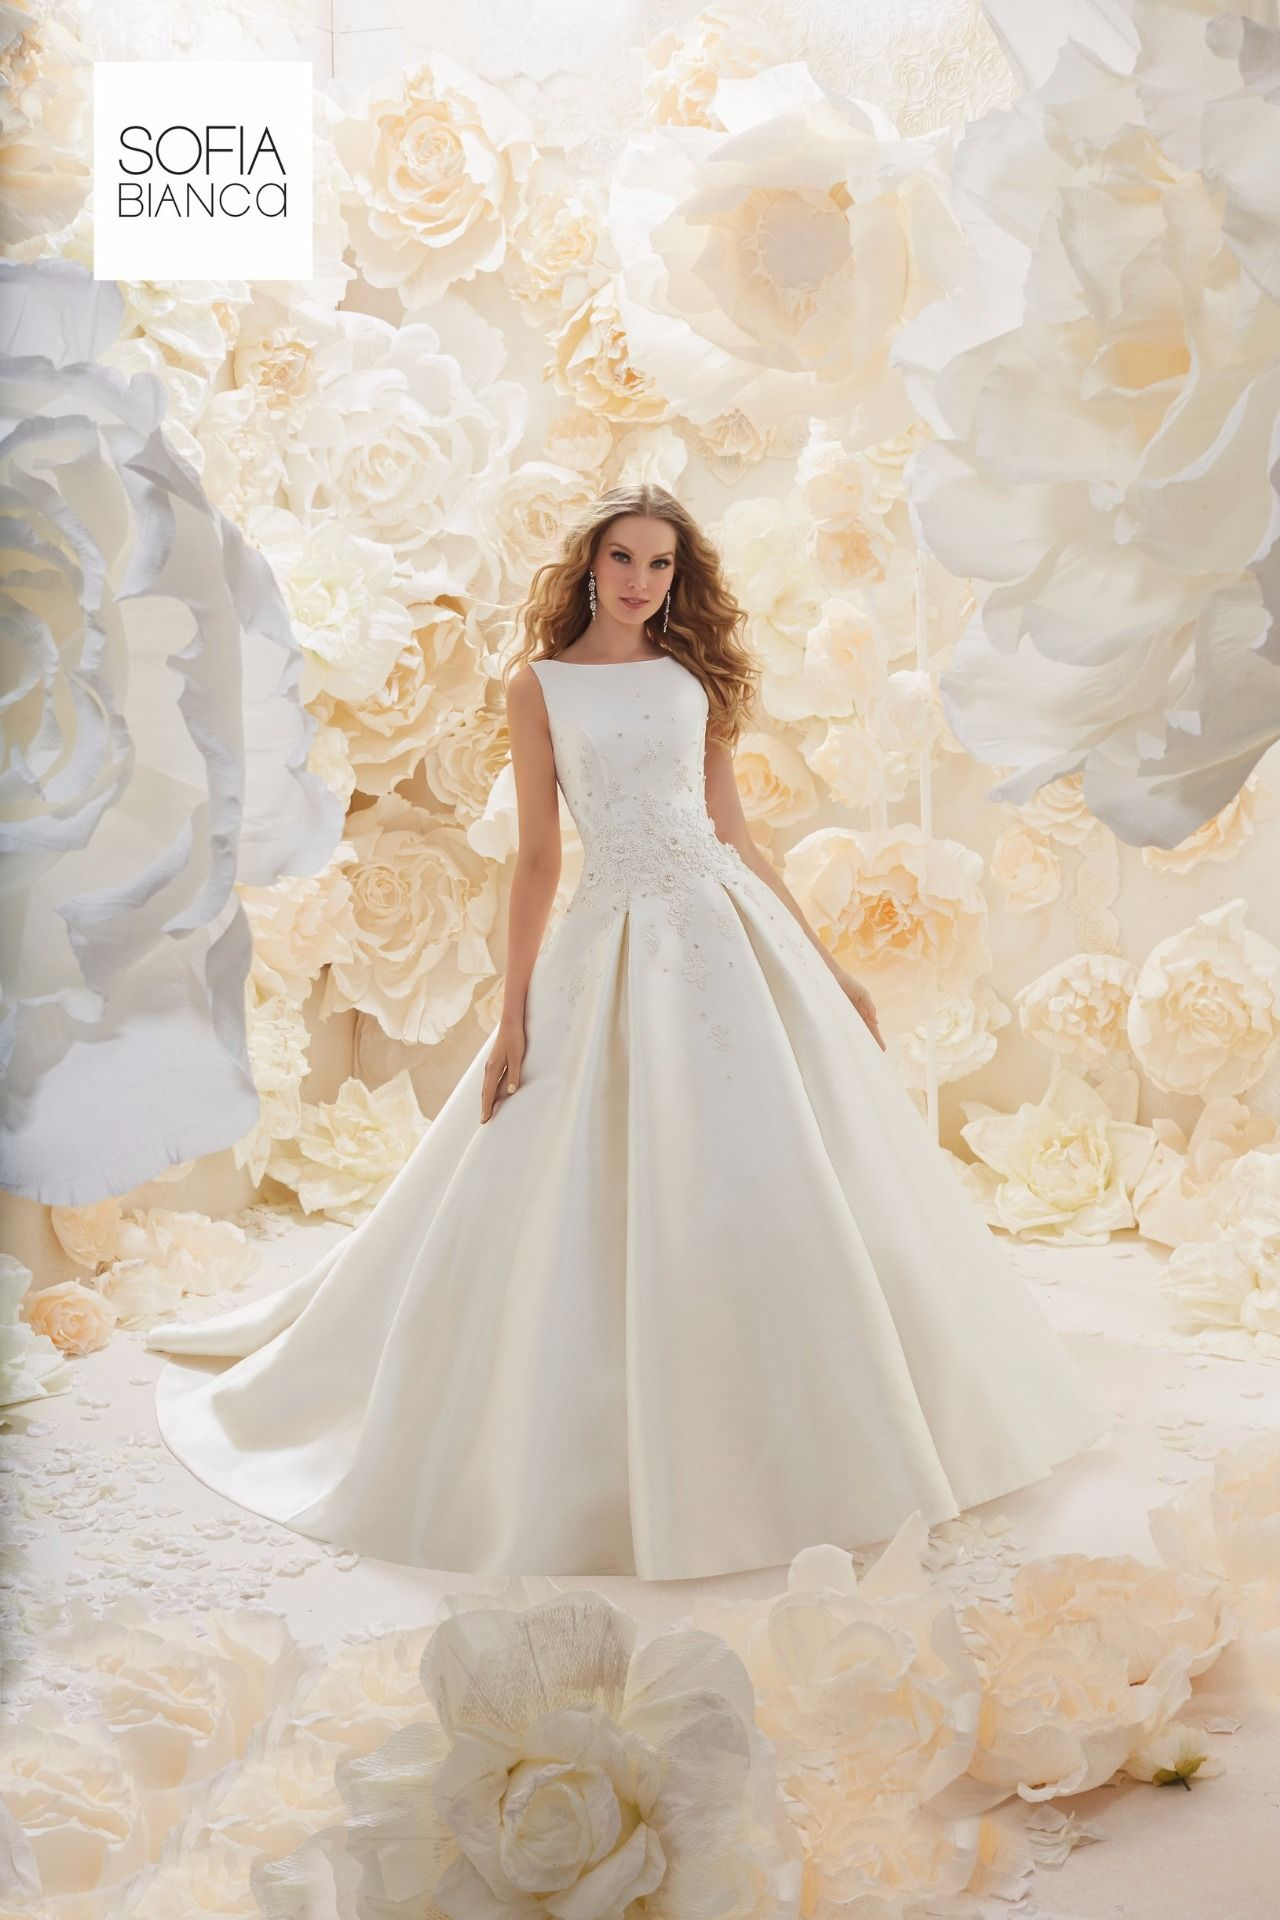 Sofia Bianca Bridal Dresses Newcastle | Brides | Pinterest | Dress ...